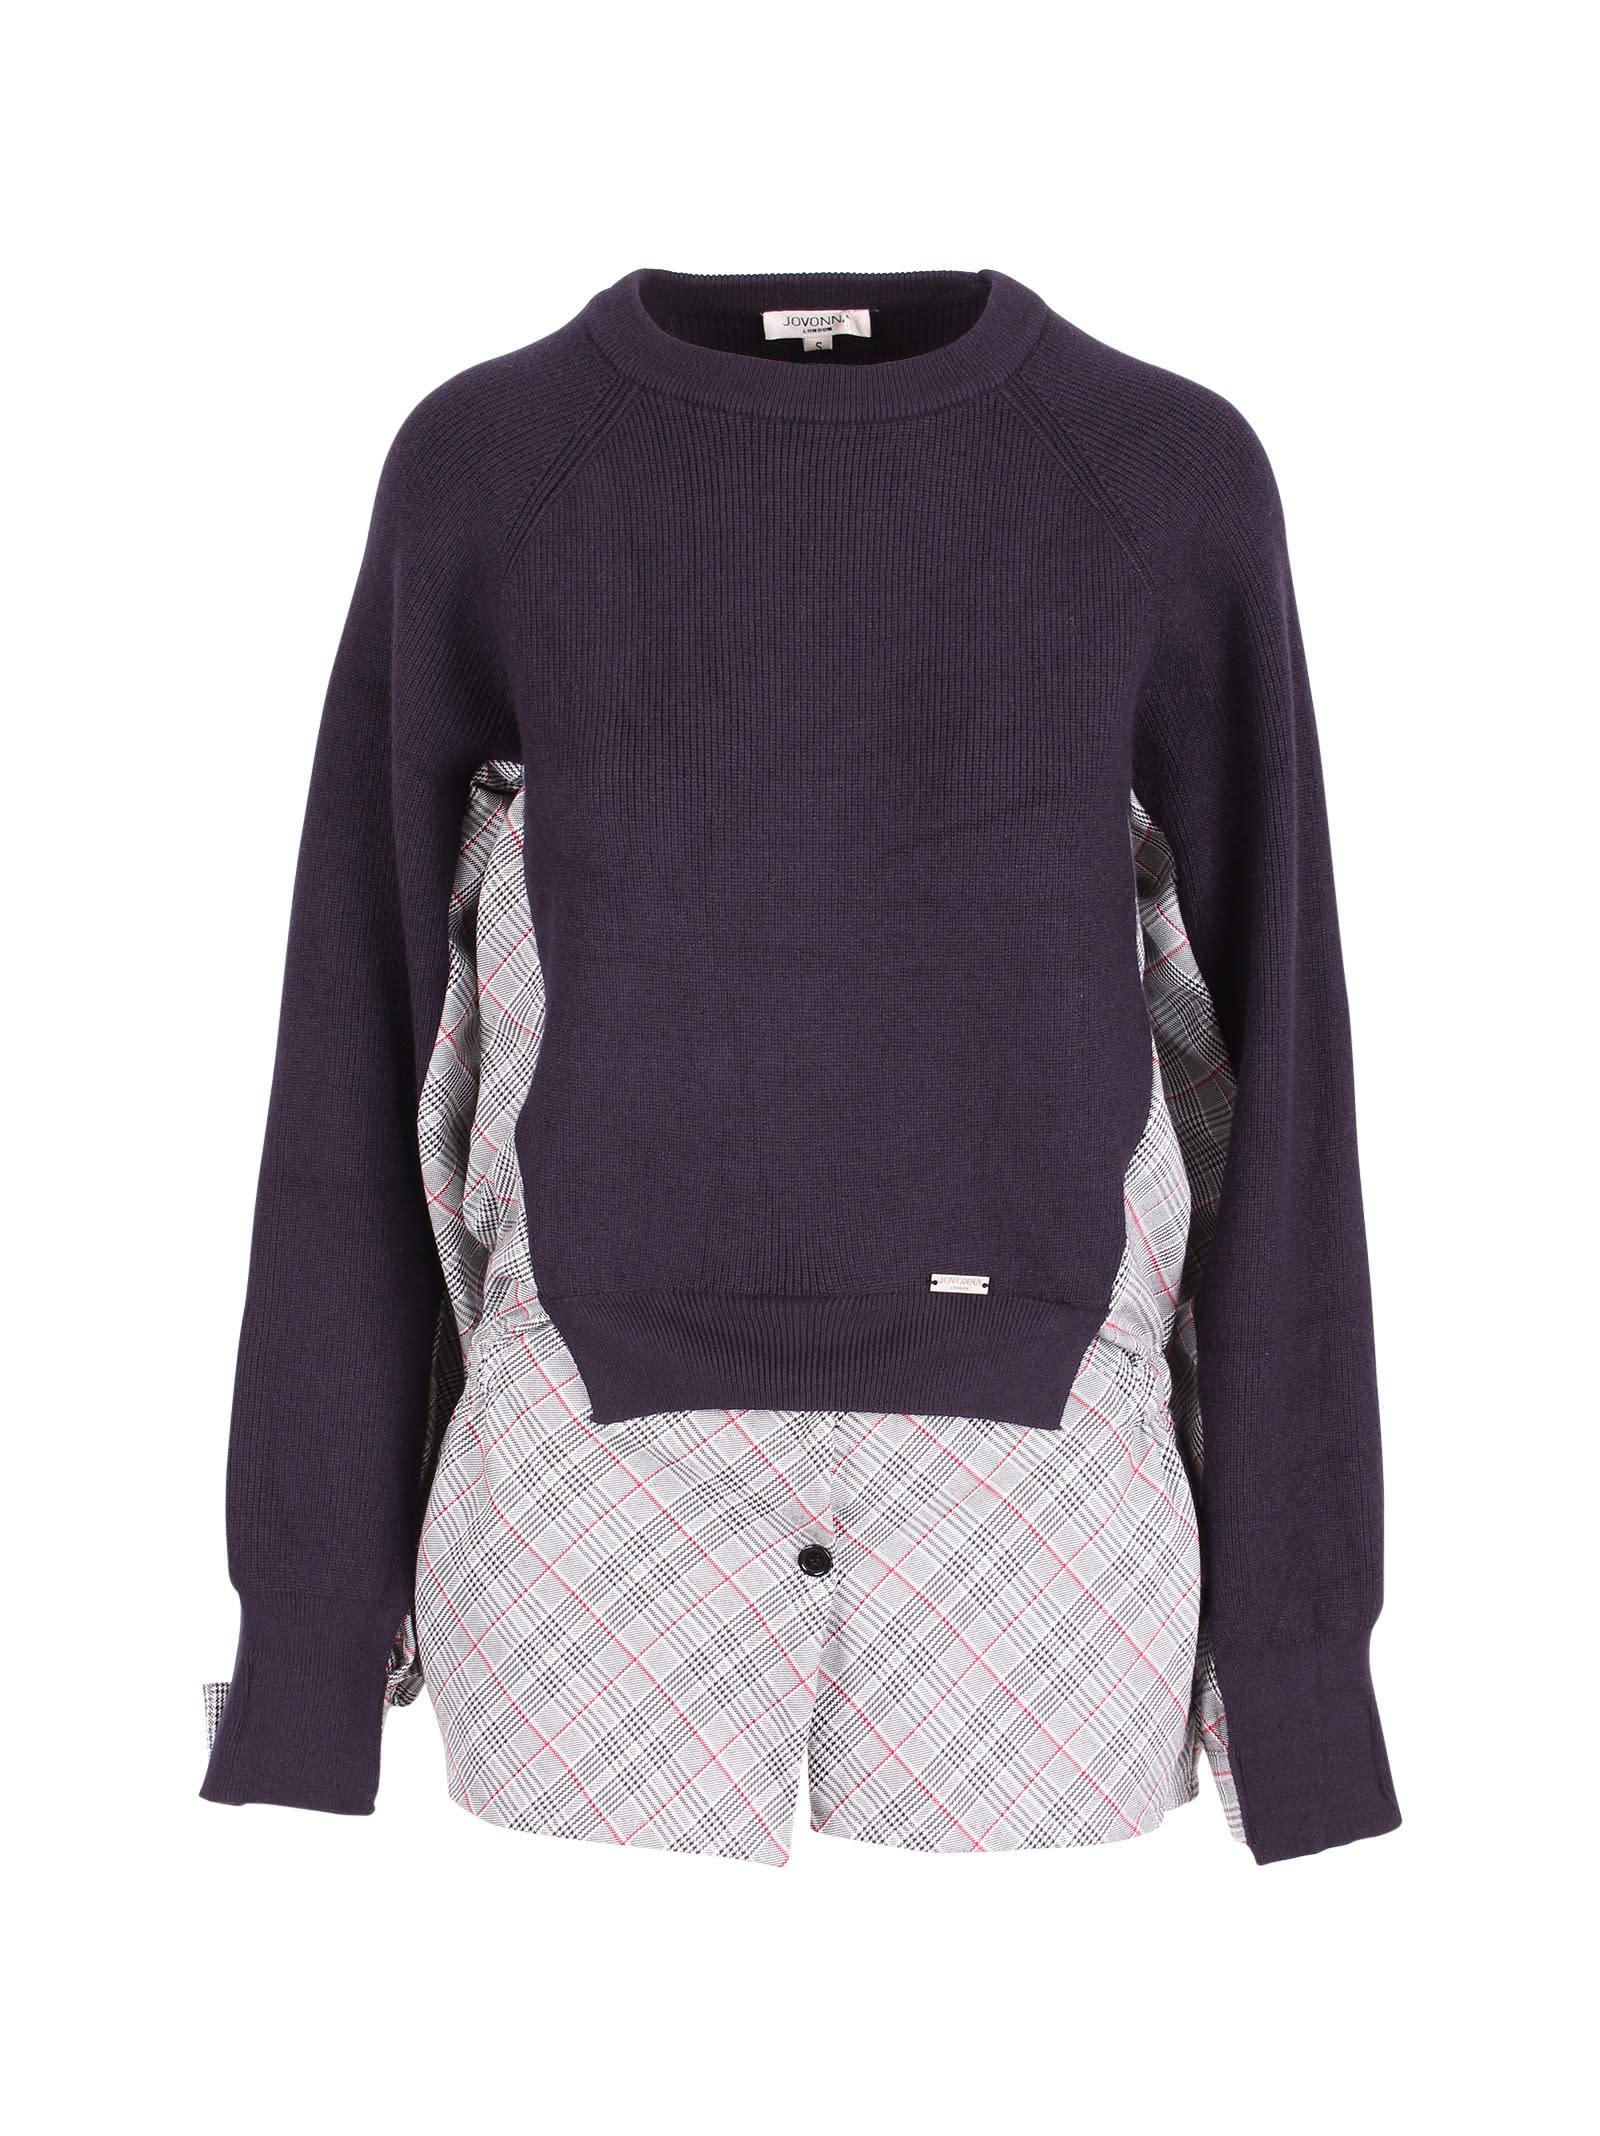 London calixte Viscose Sweater